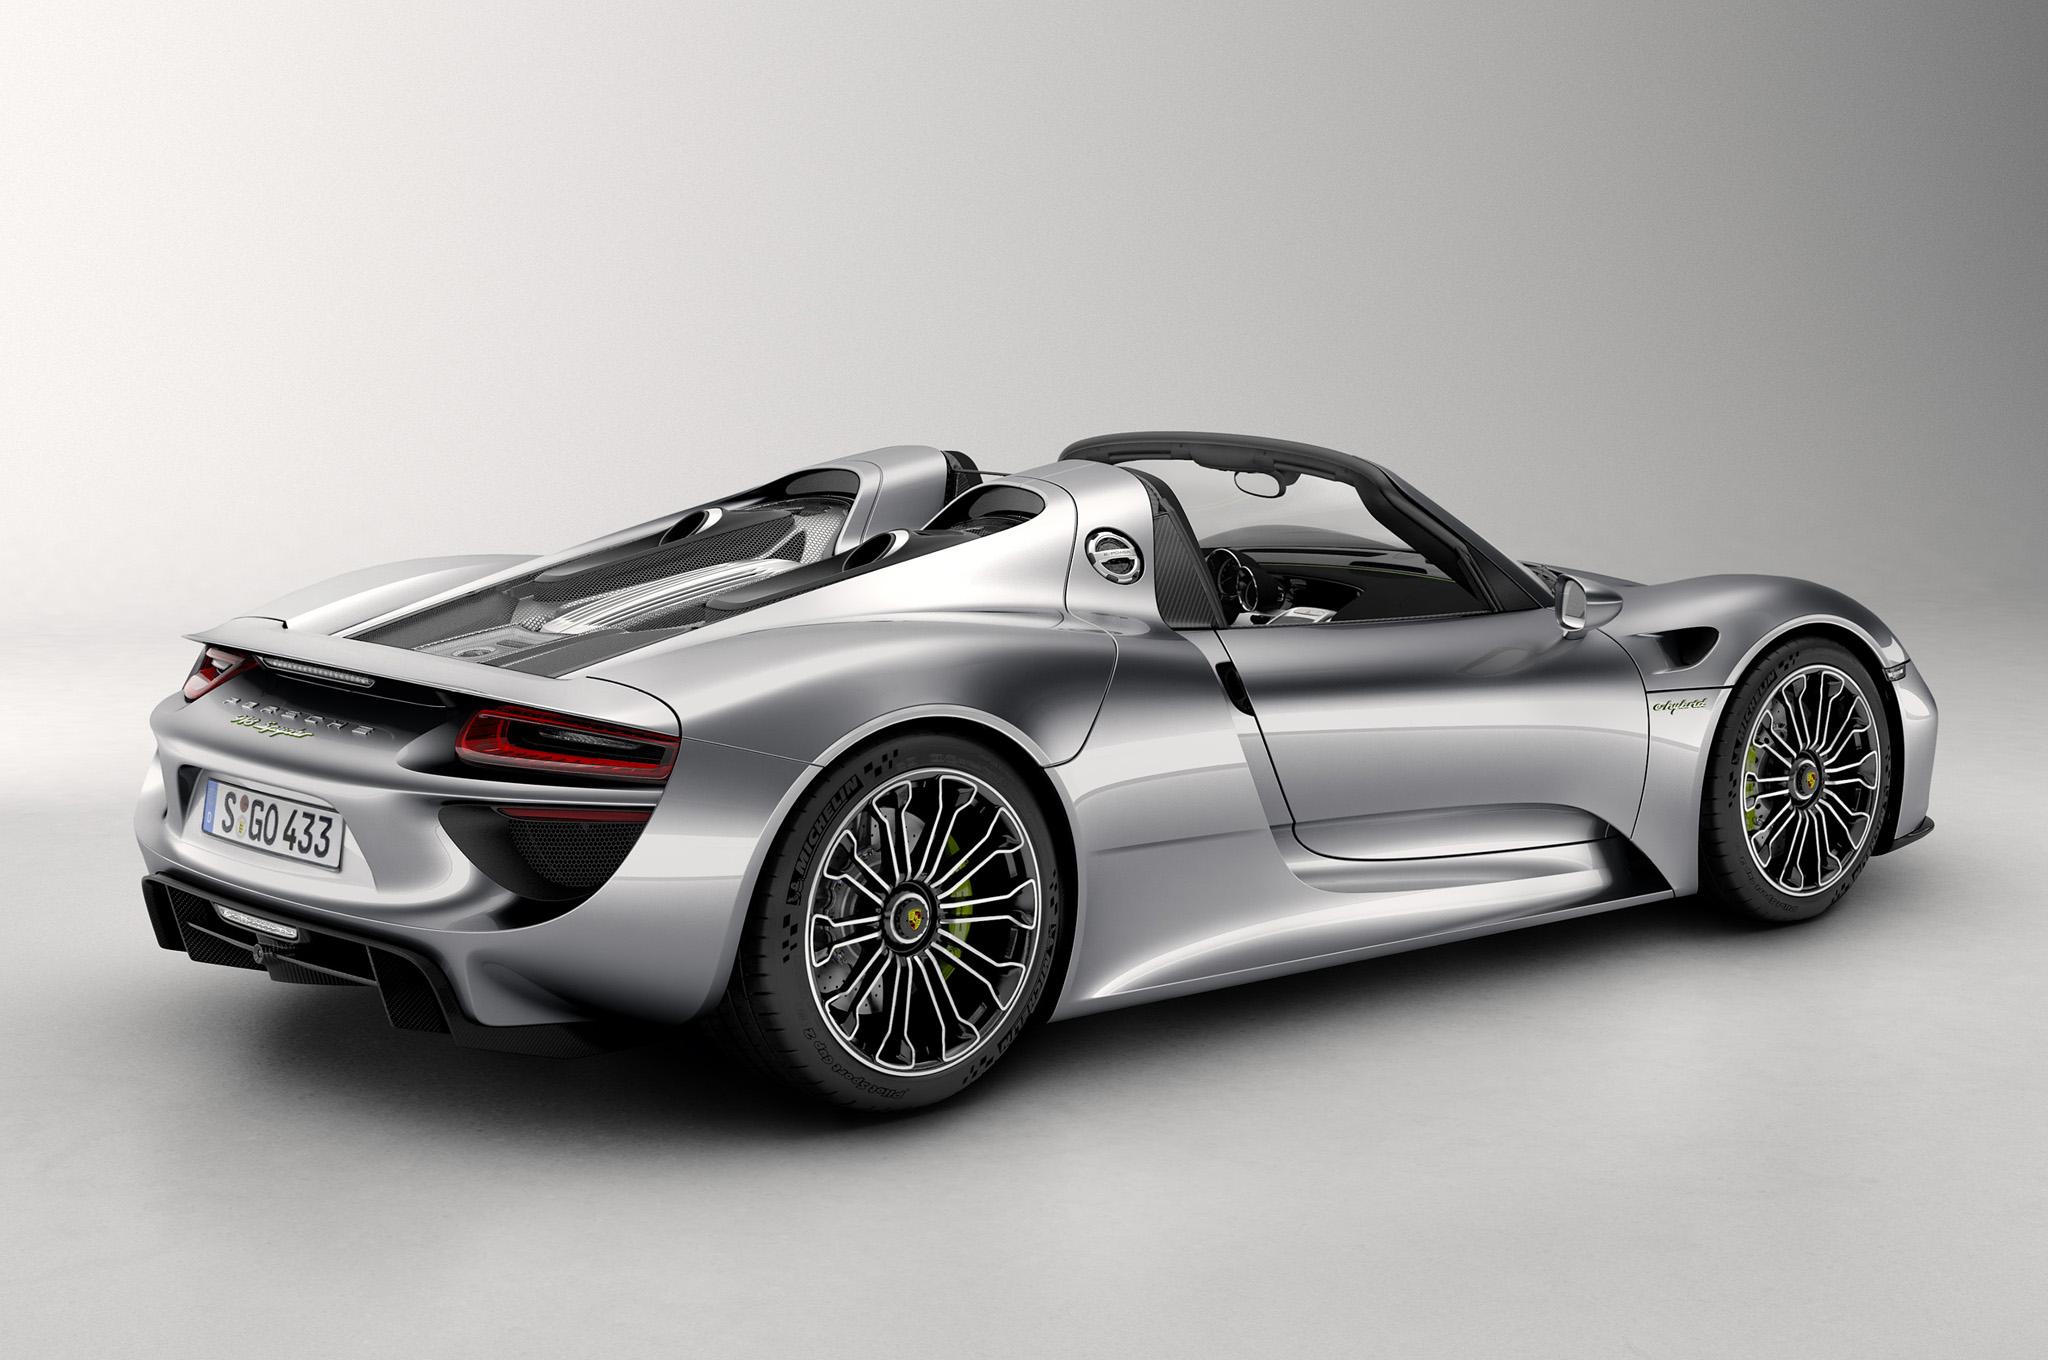 Porsche-918_Spyder_mp42_pic_106660 Remarkable Porsche 918 Spyder Concept top Gear Cars Trend